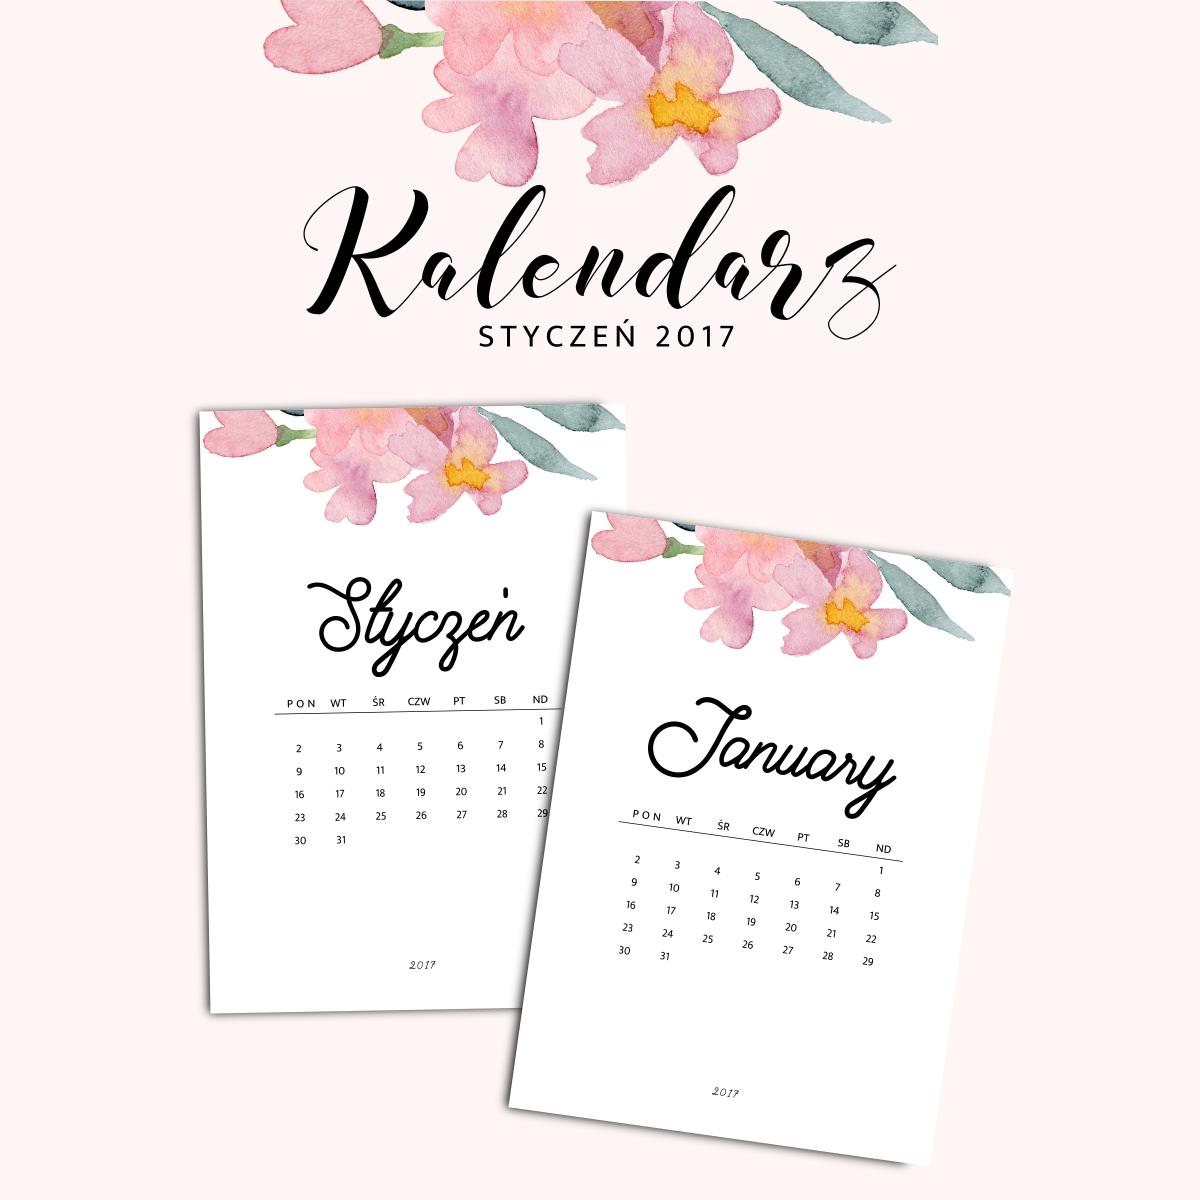 kalendarz 2017 do druku do pobrania za darmo